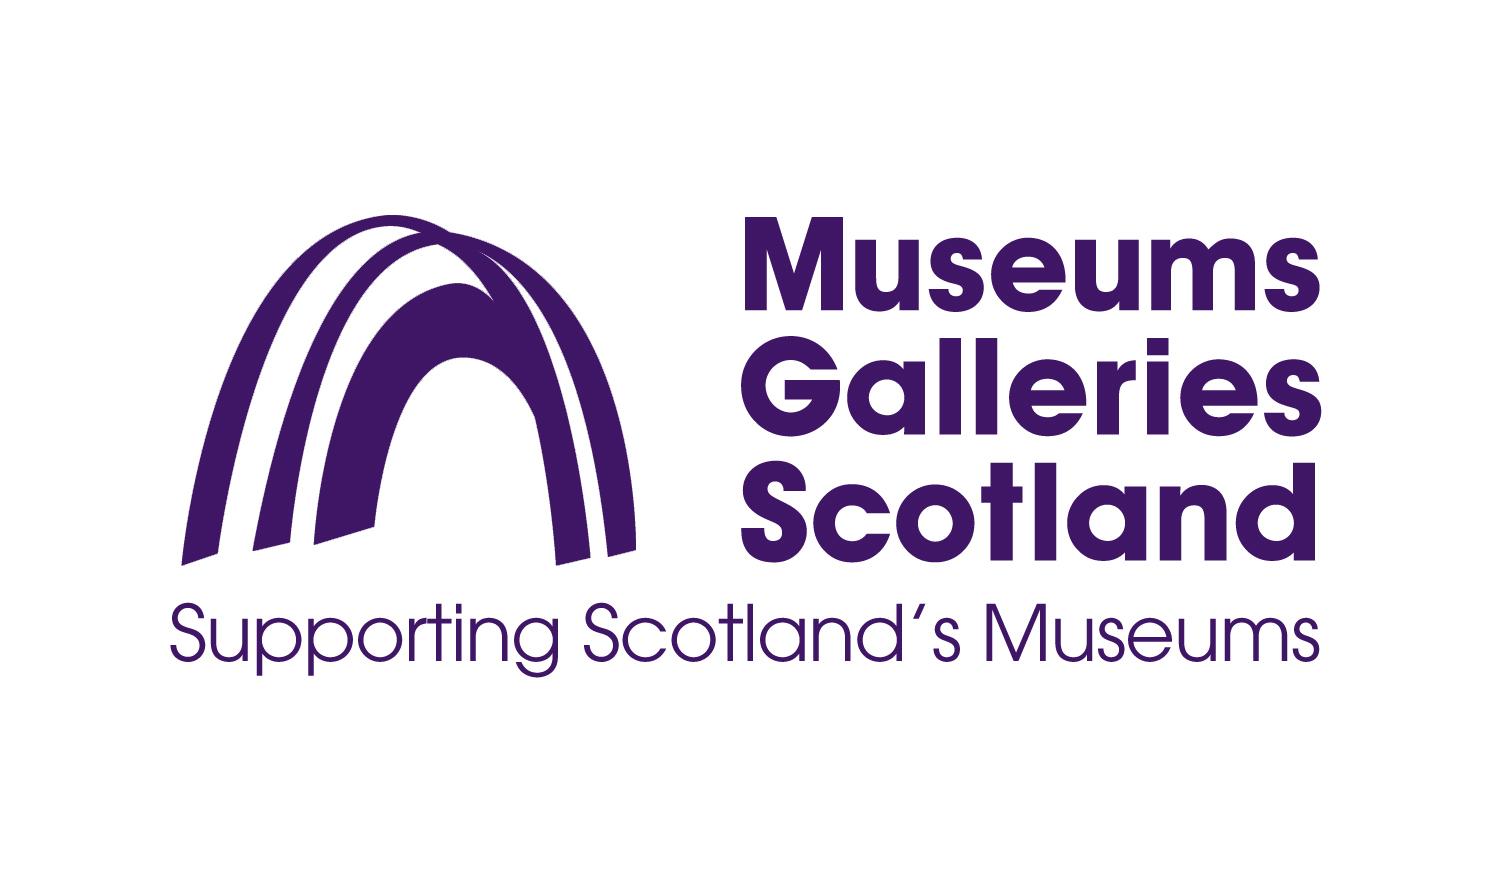 MGS(MuesumsGalleriesScotland)_ID.jpg